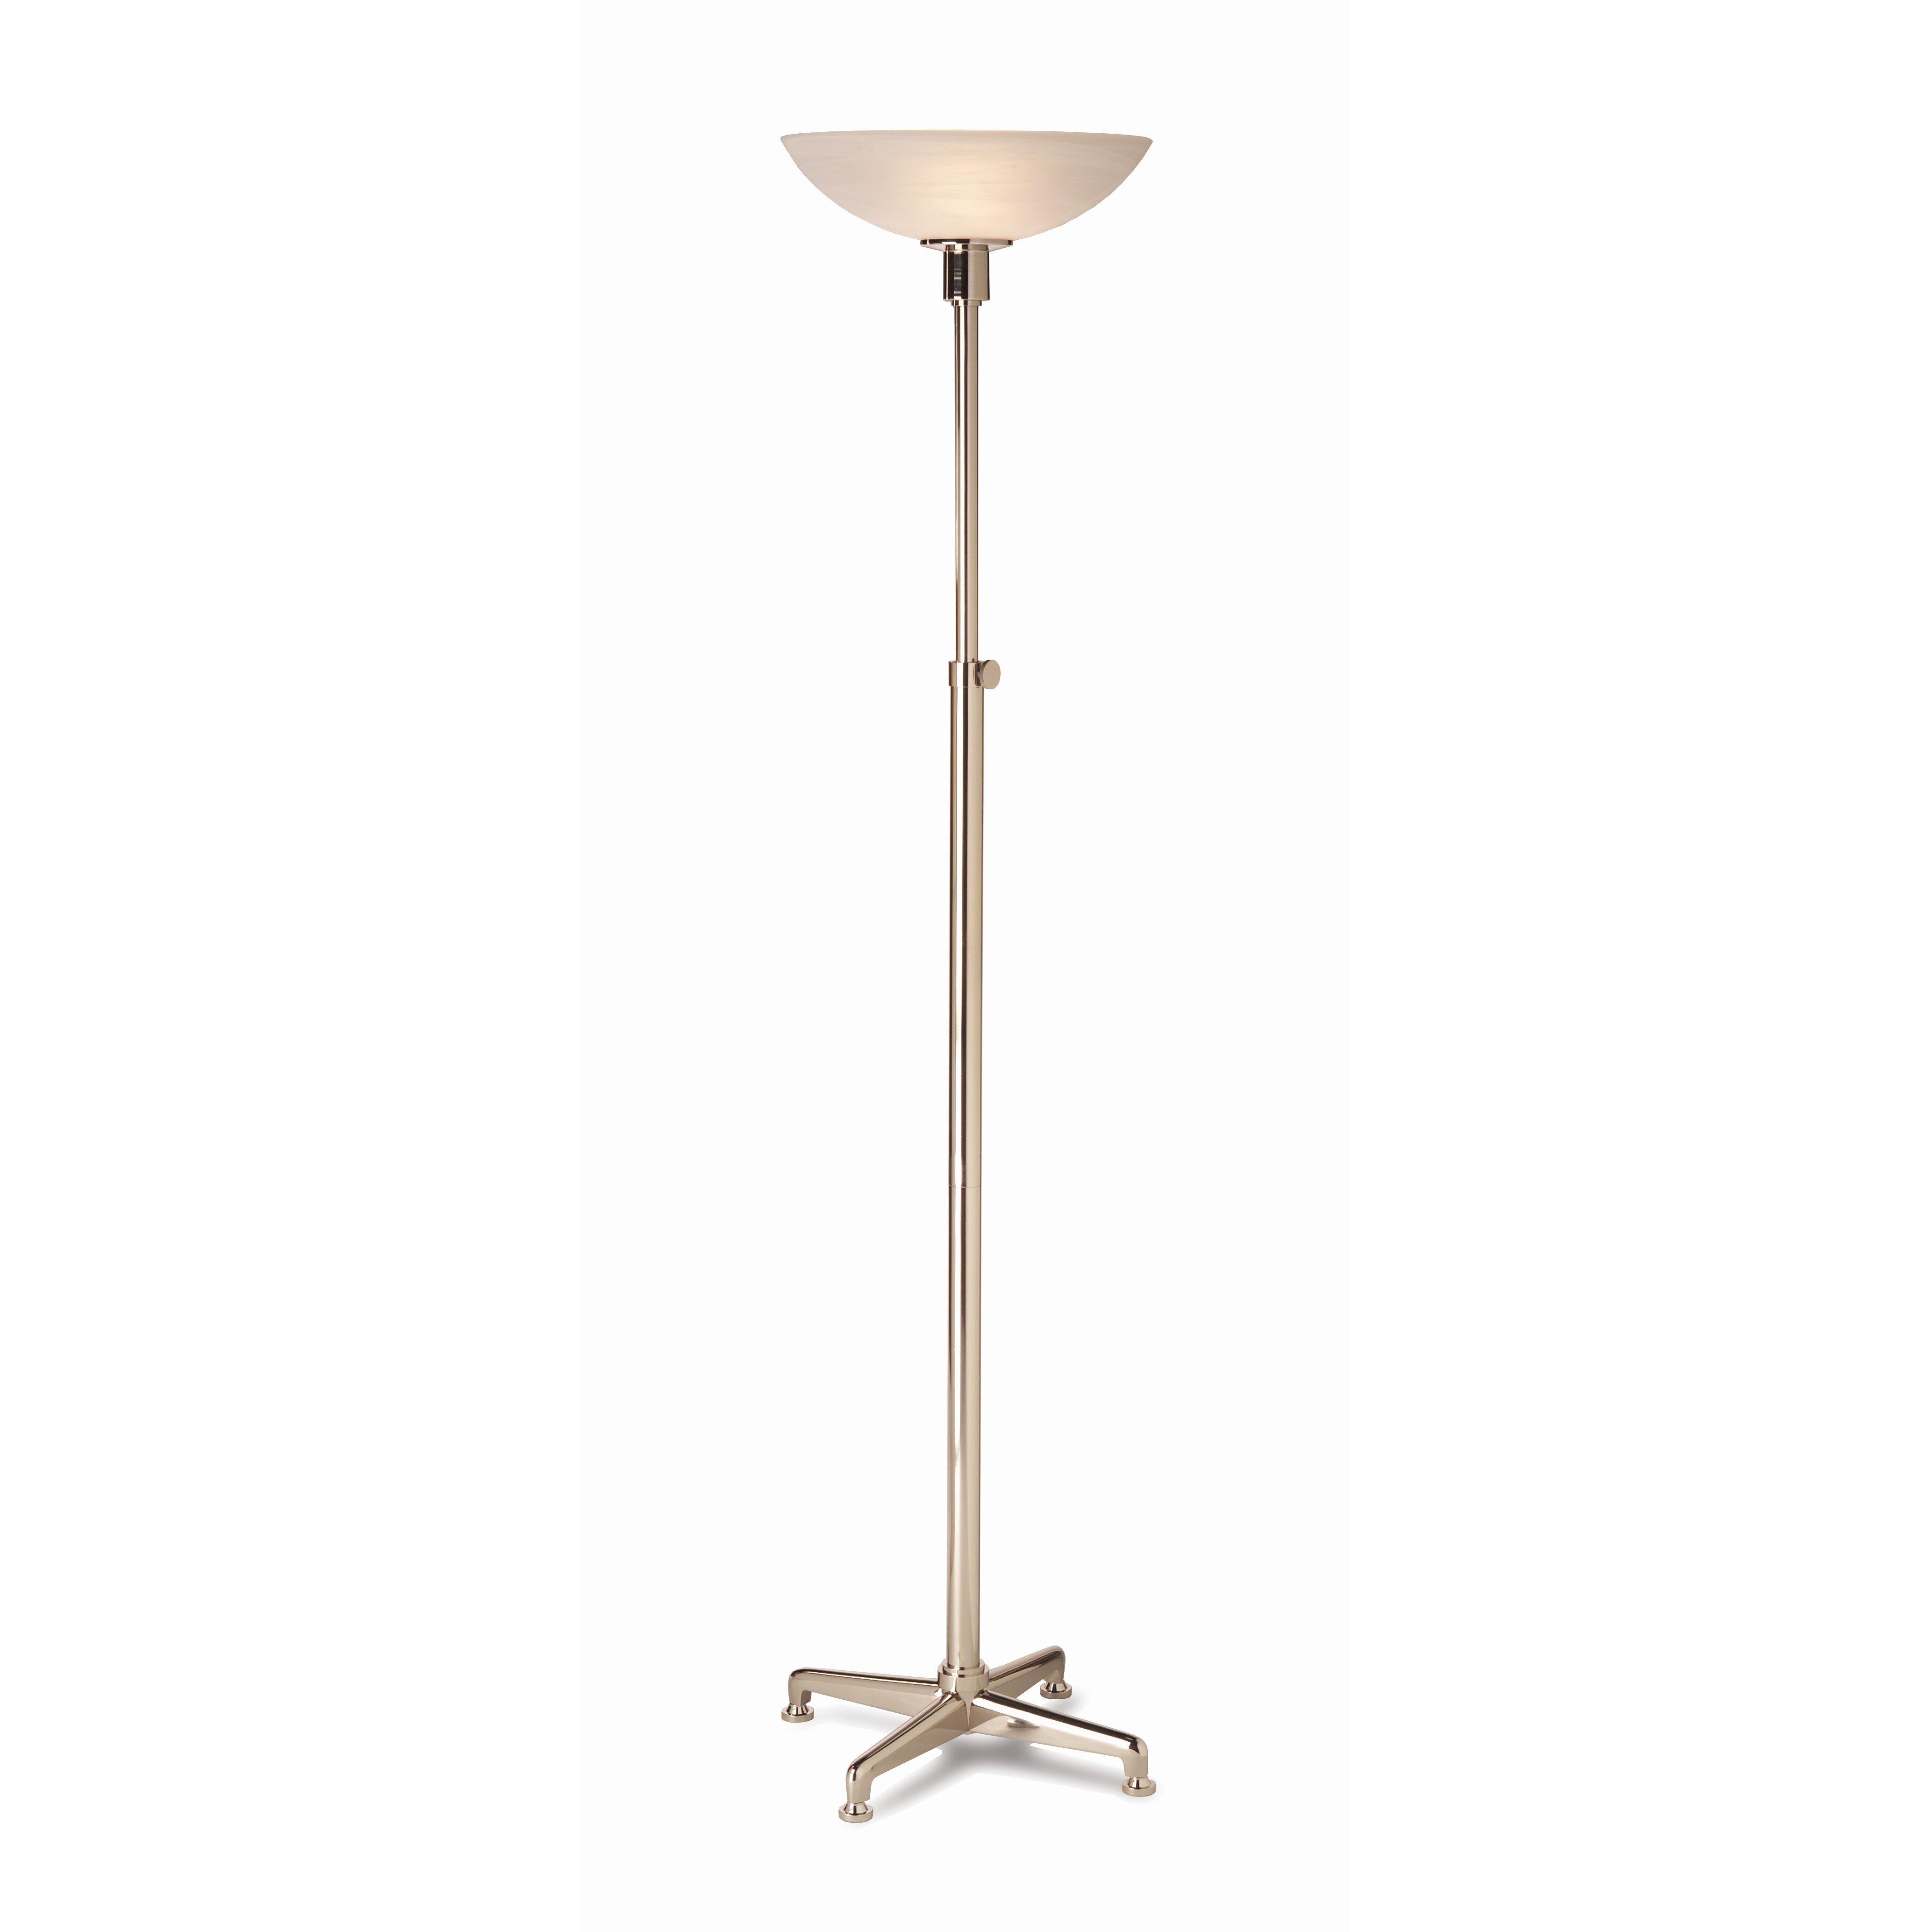 Industrial floor torchier lamp wayfair for Wayfair industrial lamp